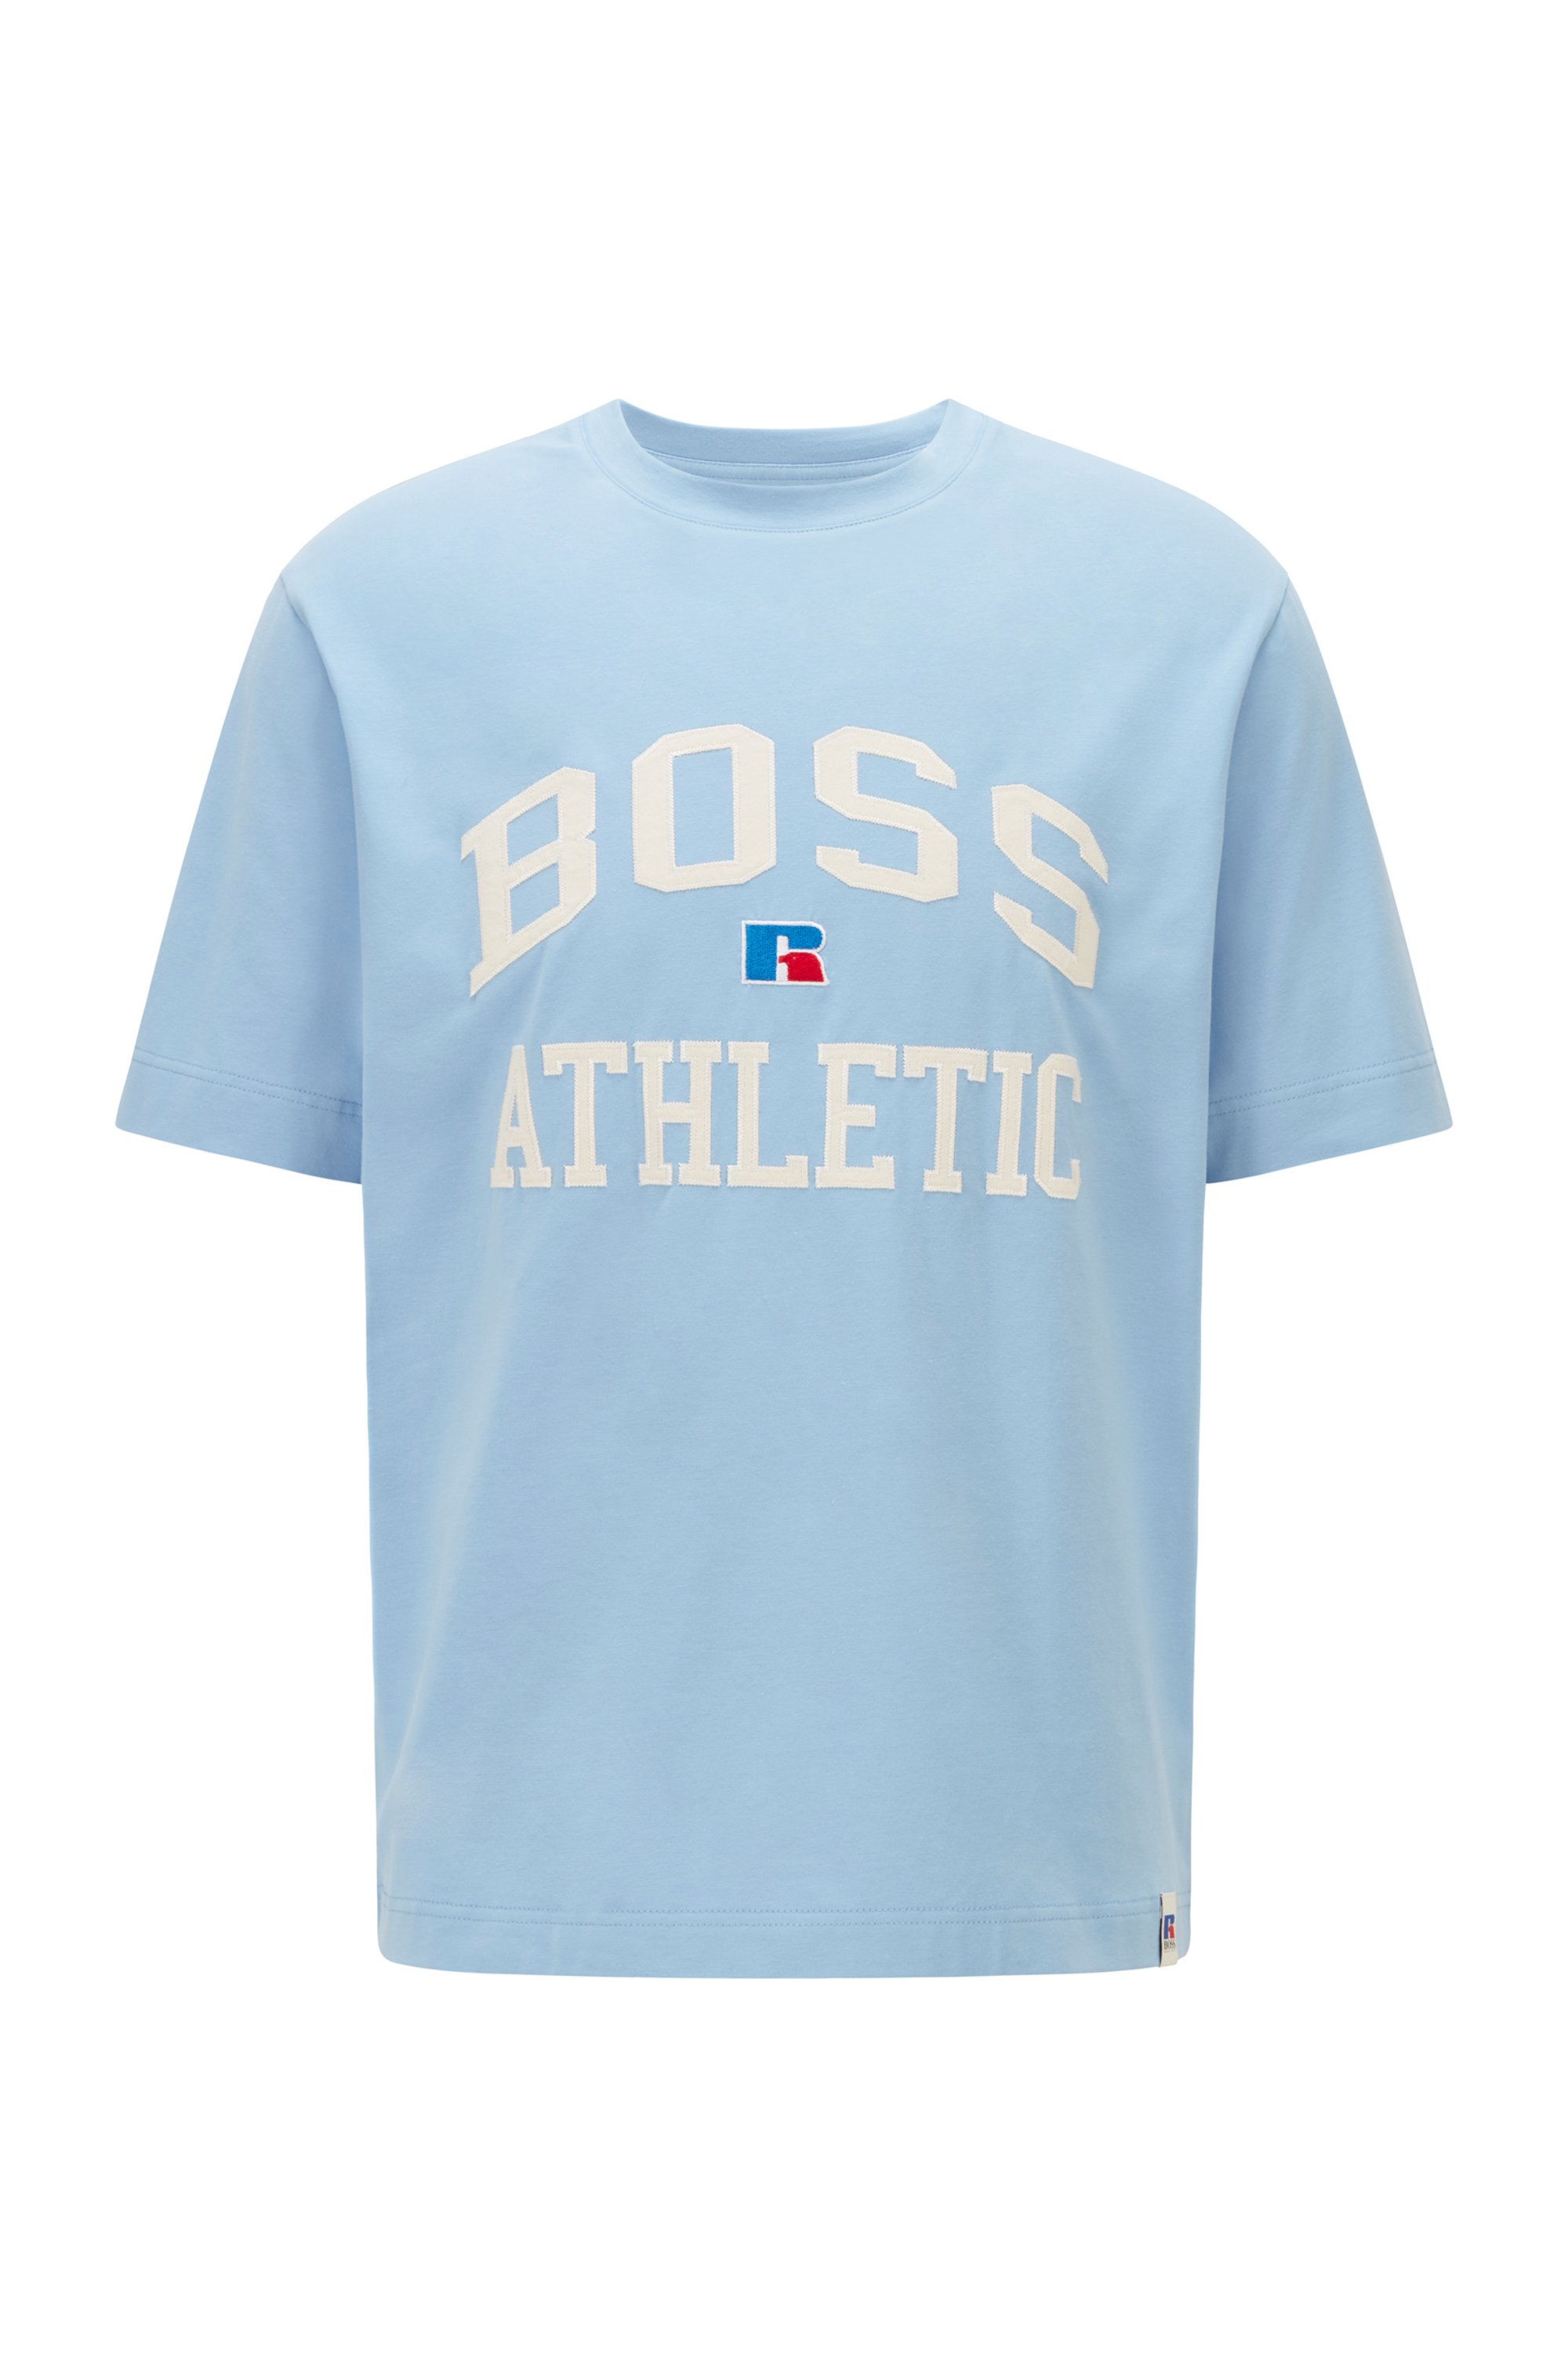 Camiseta unisex relaxed fit en algodón elástico con logo exclusivo, Celeste